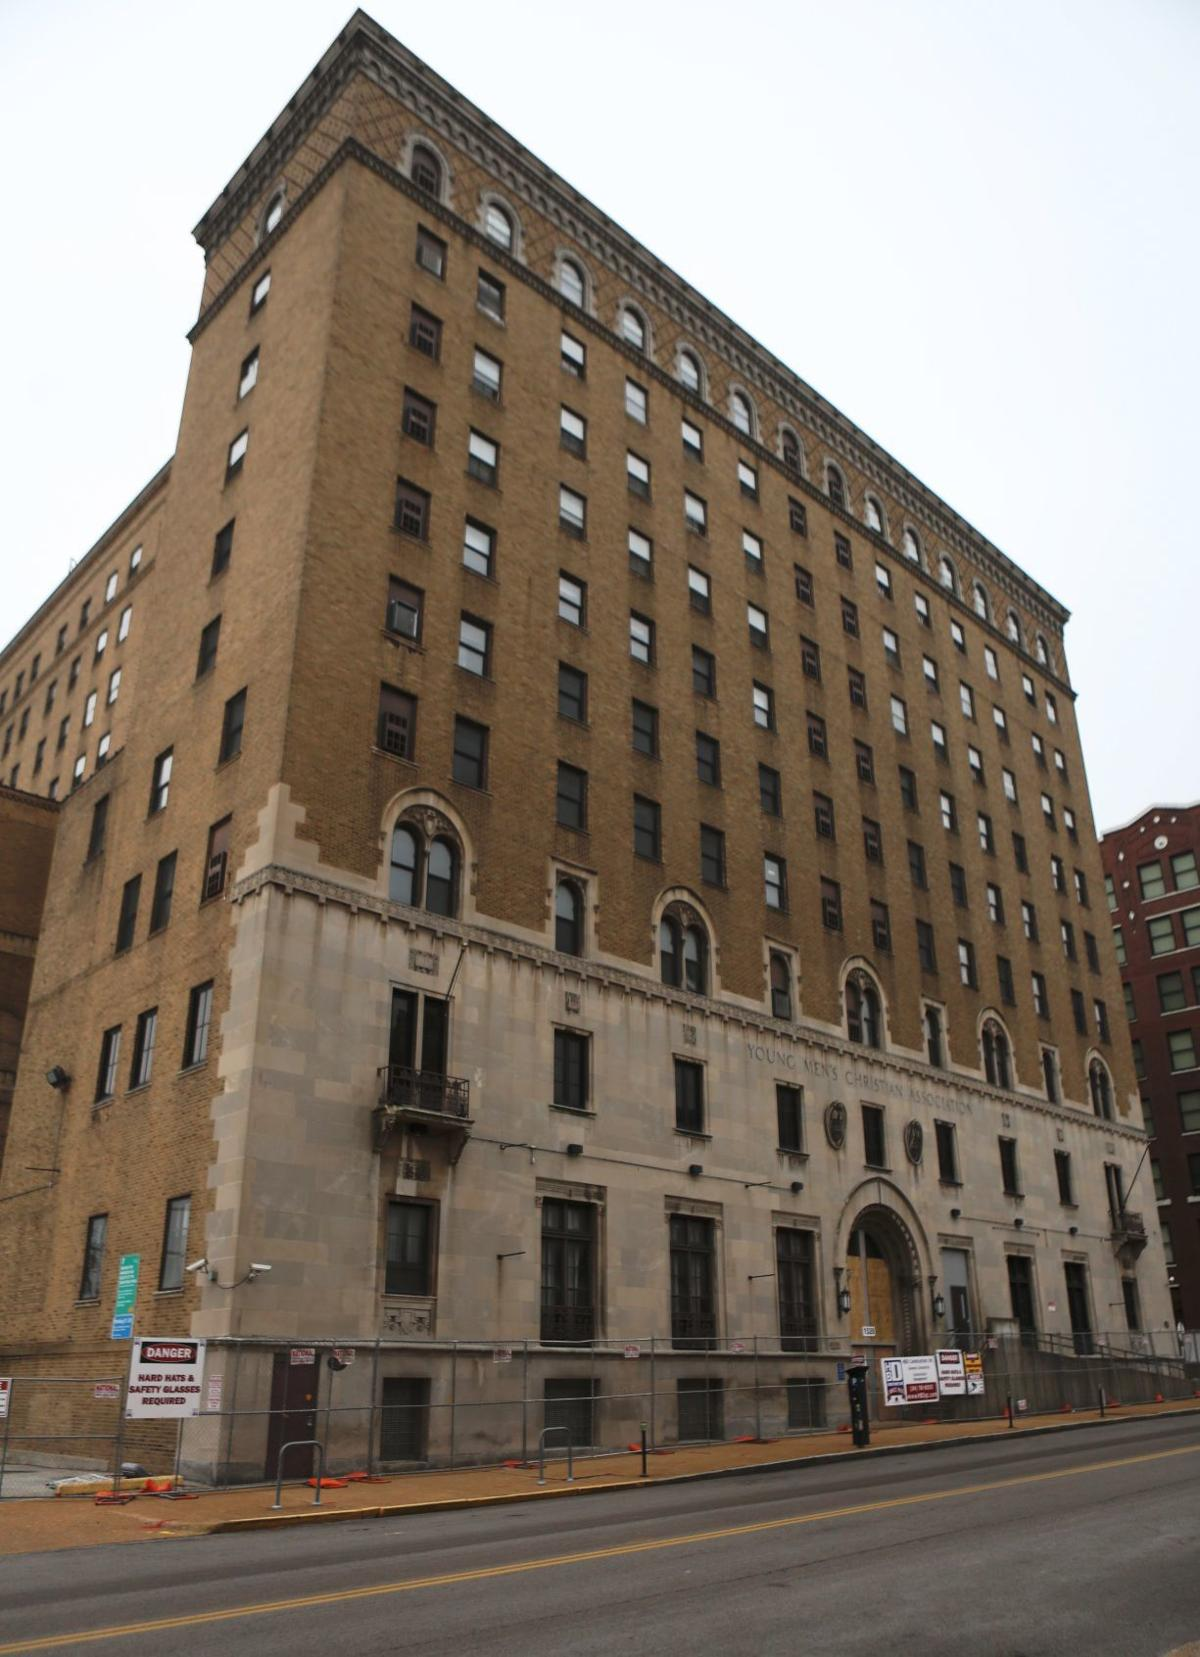 Former YMCA building